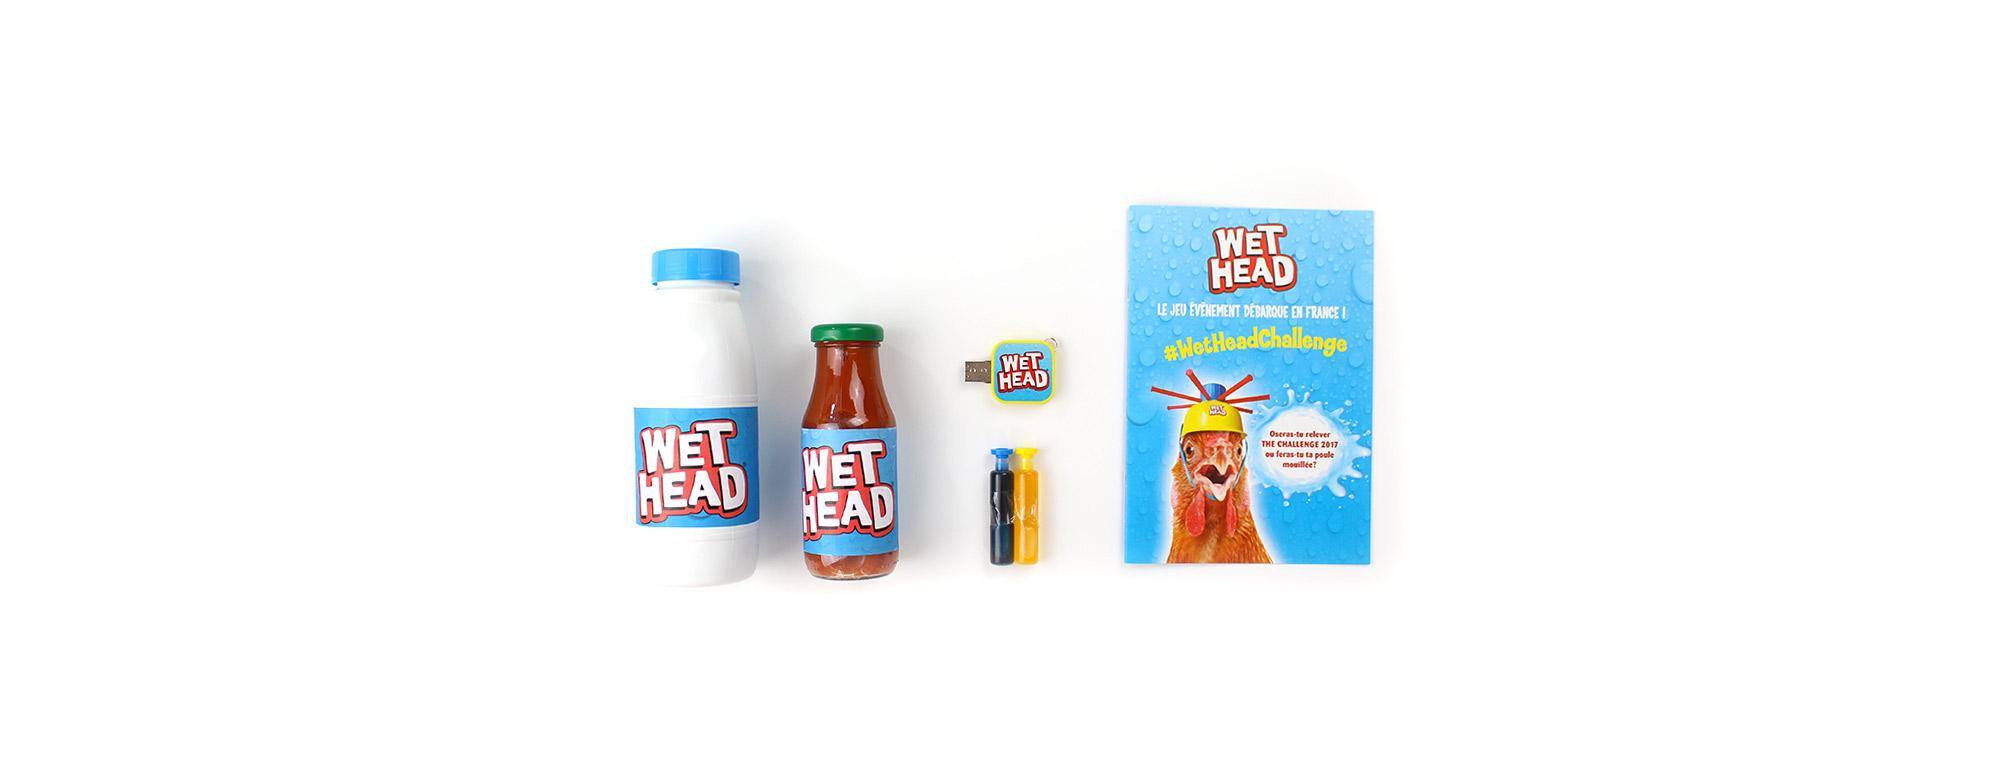 Wet Head - Communication digitale par Sharing Agency